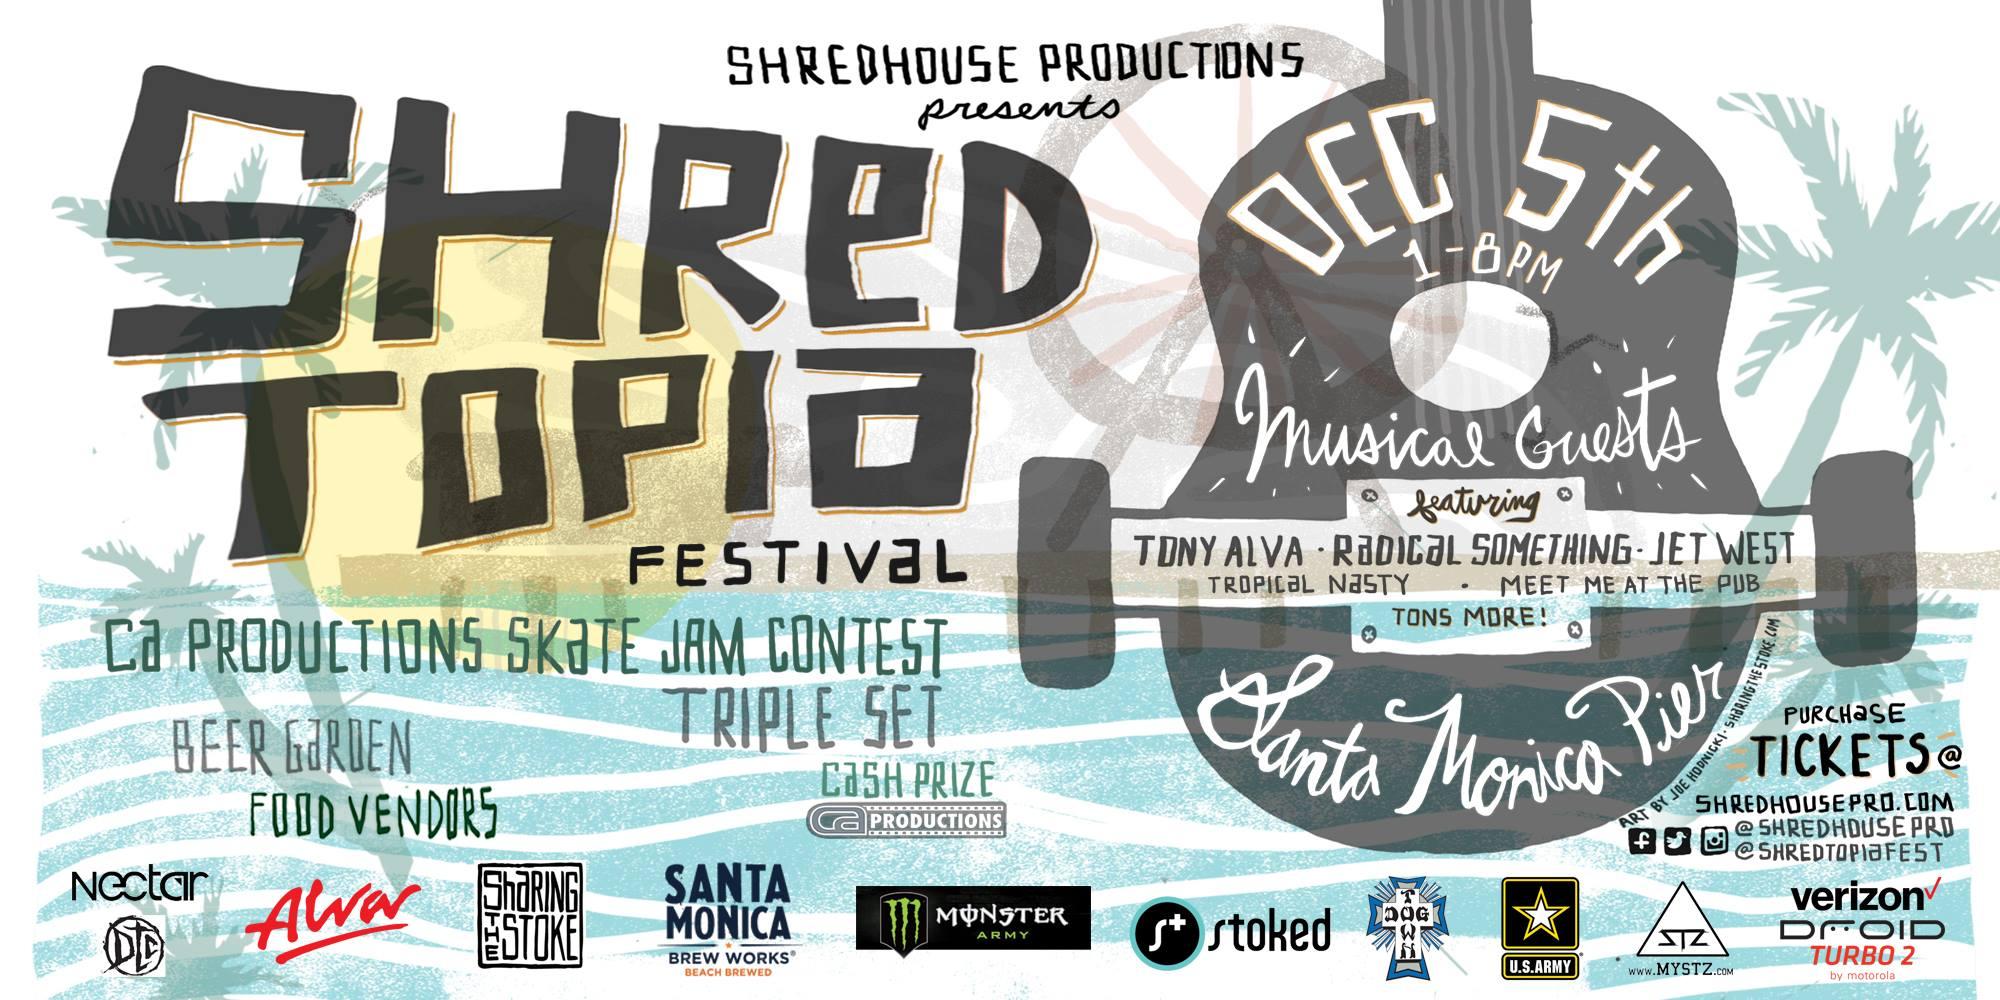 shredtopia flyer